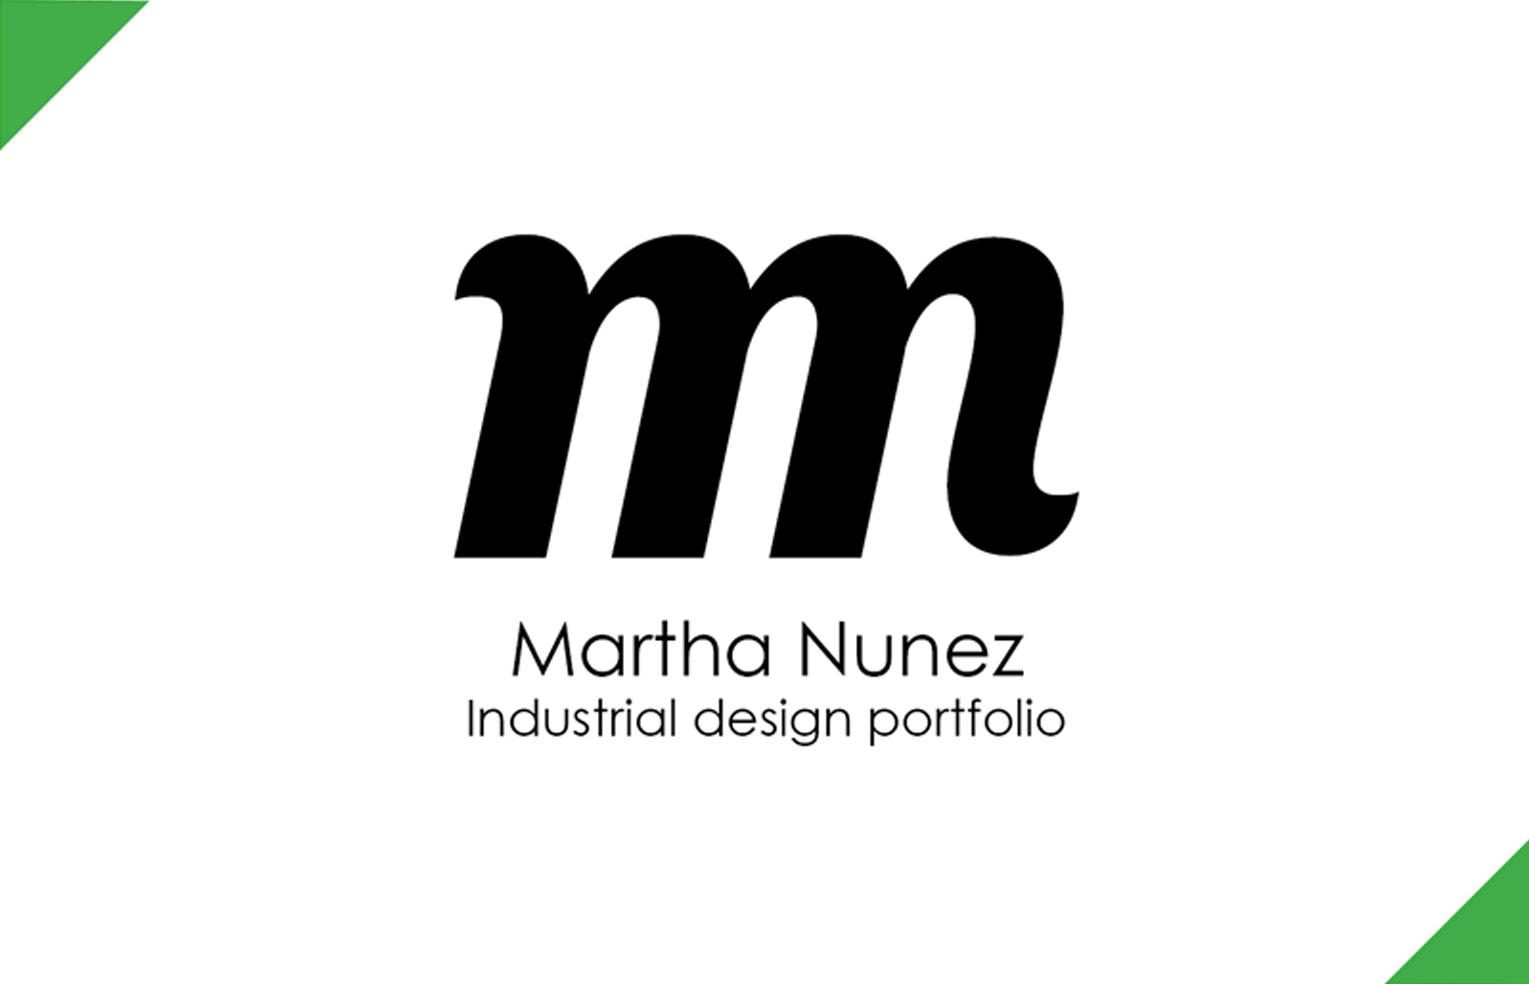 Martha Nunez Industrial Design Portfolio